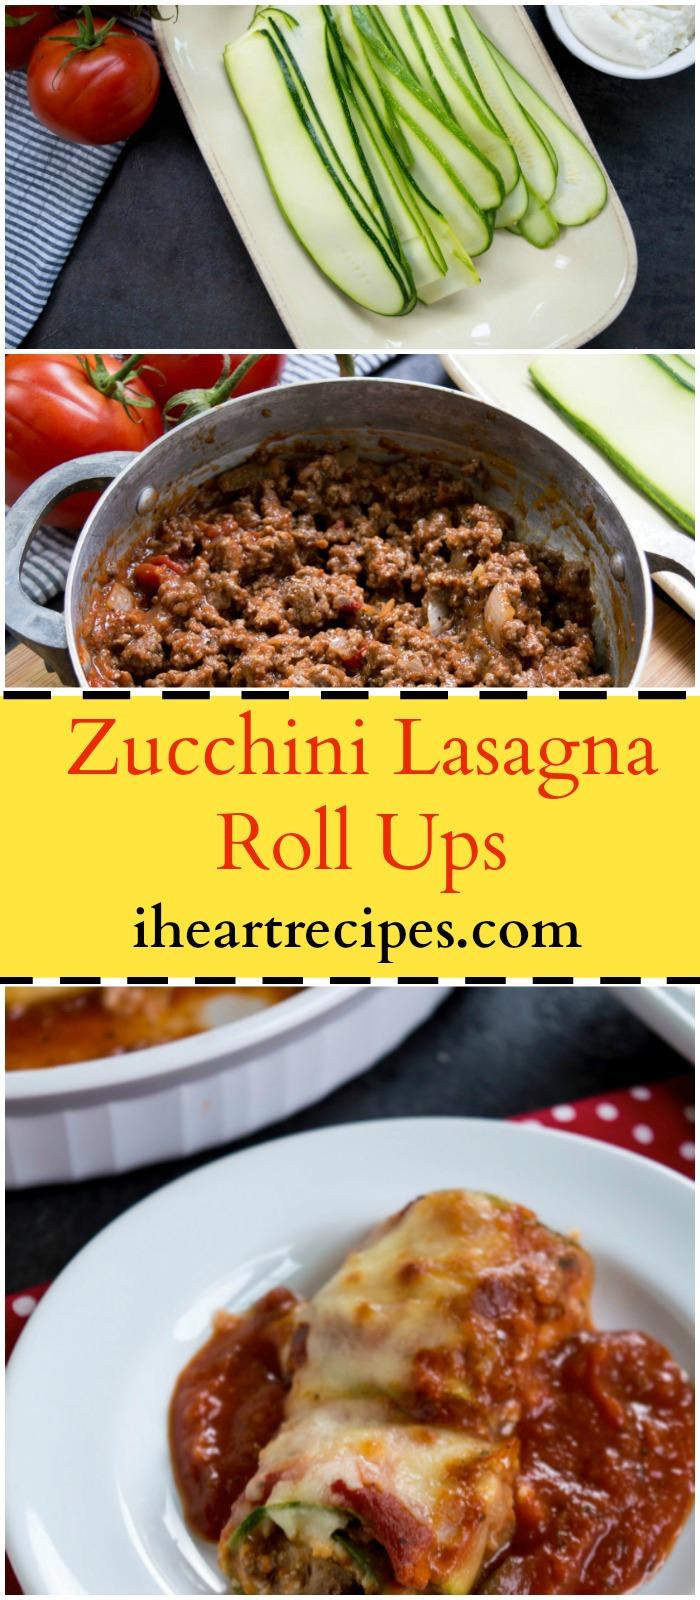 Zucchini Lasagna Roll Ups with Beef & Ricotta | I Heart Recipes